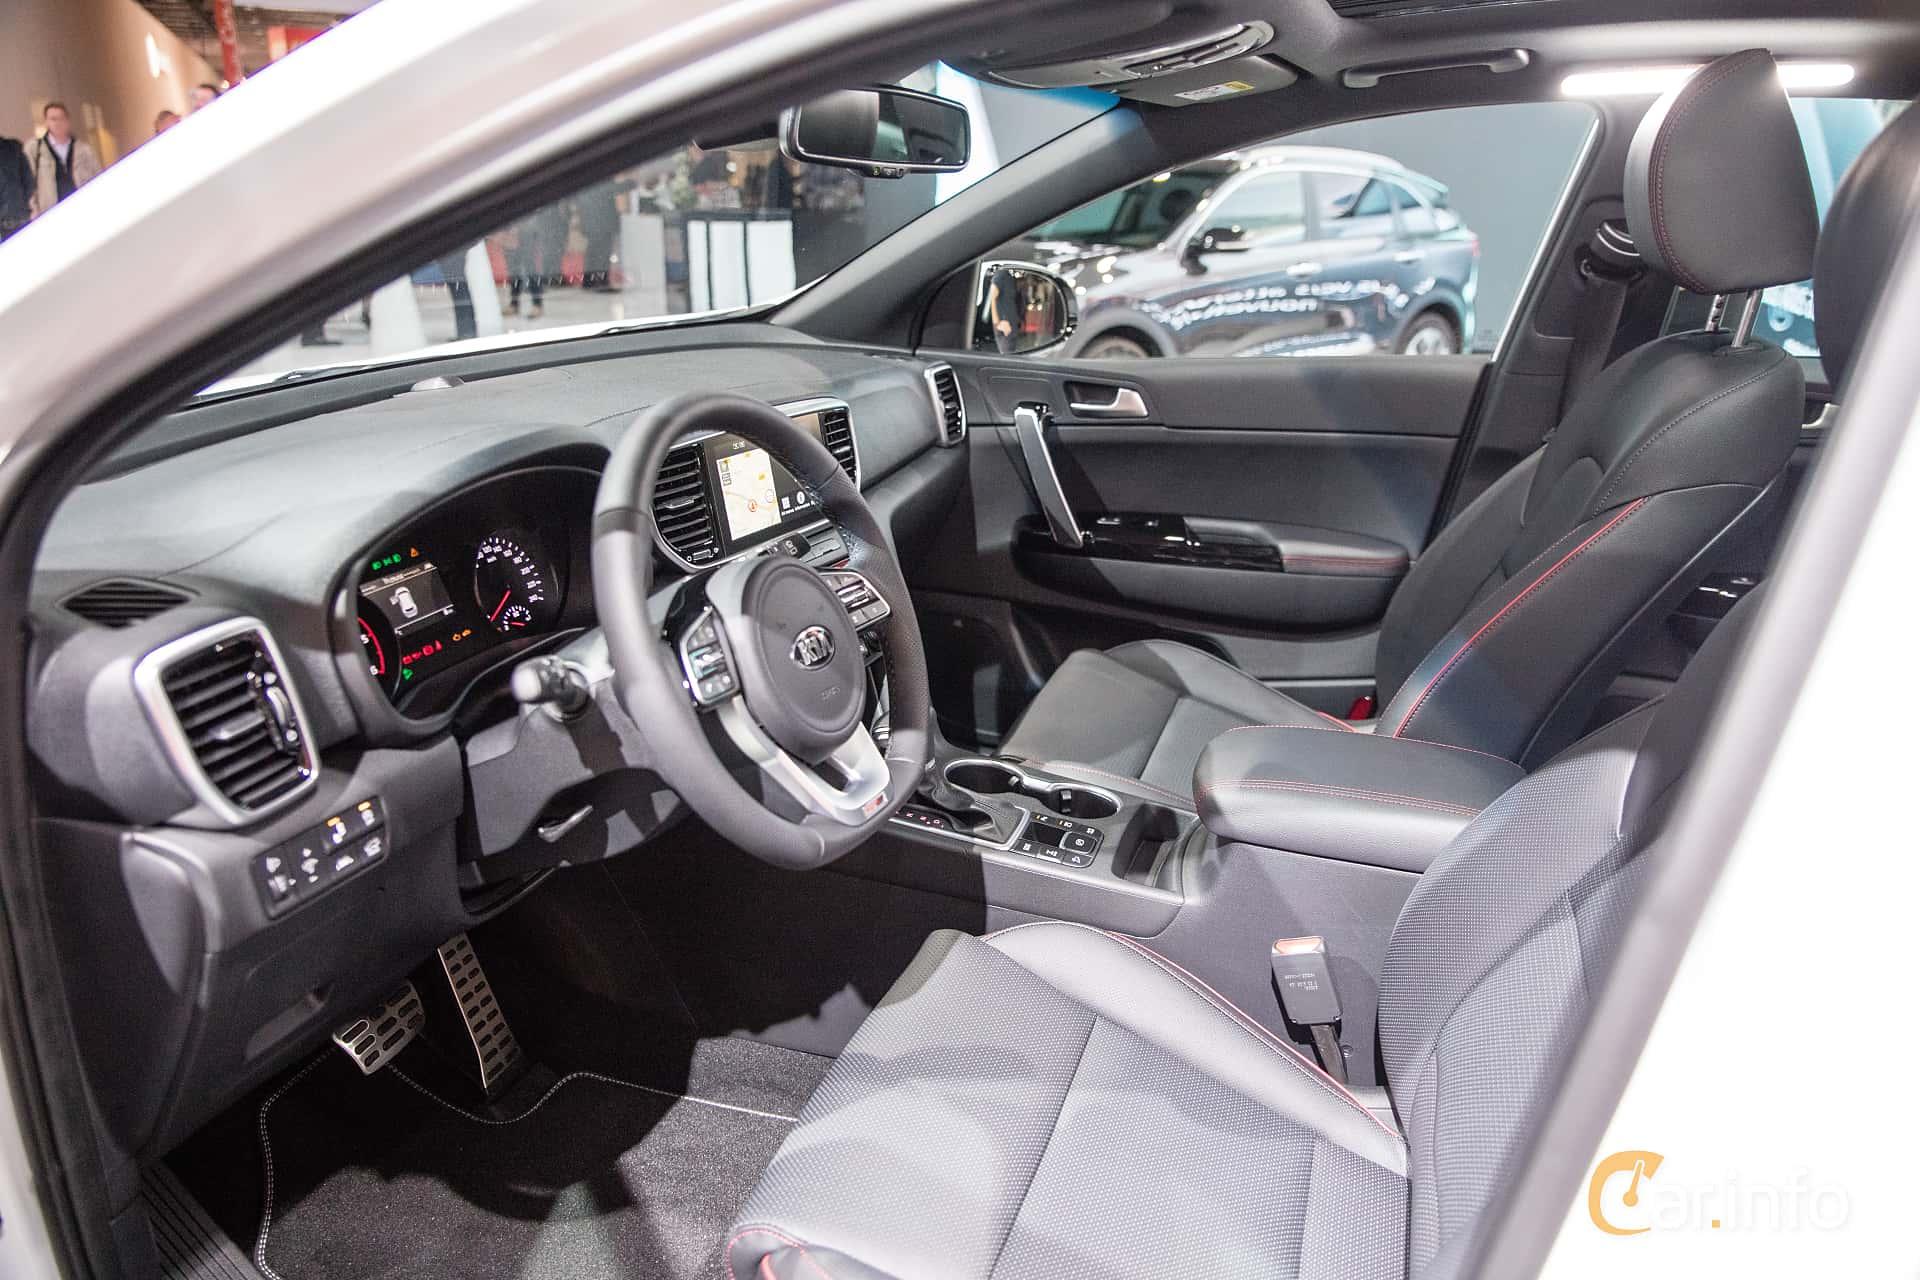 Interior of Kia Sportage 2.0 CRDi AWD Automatic, 184ps, 2019 at Paris Motor Show 2018